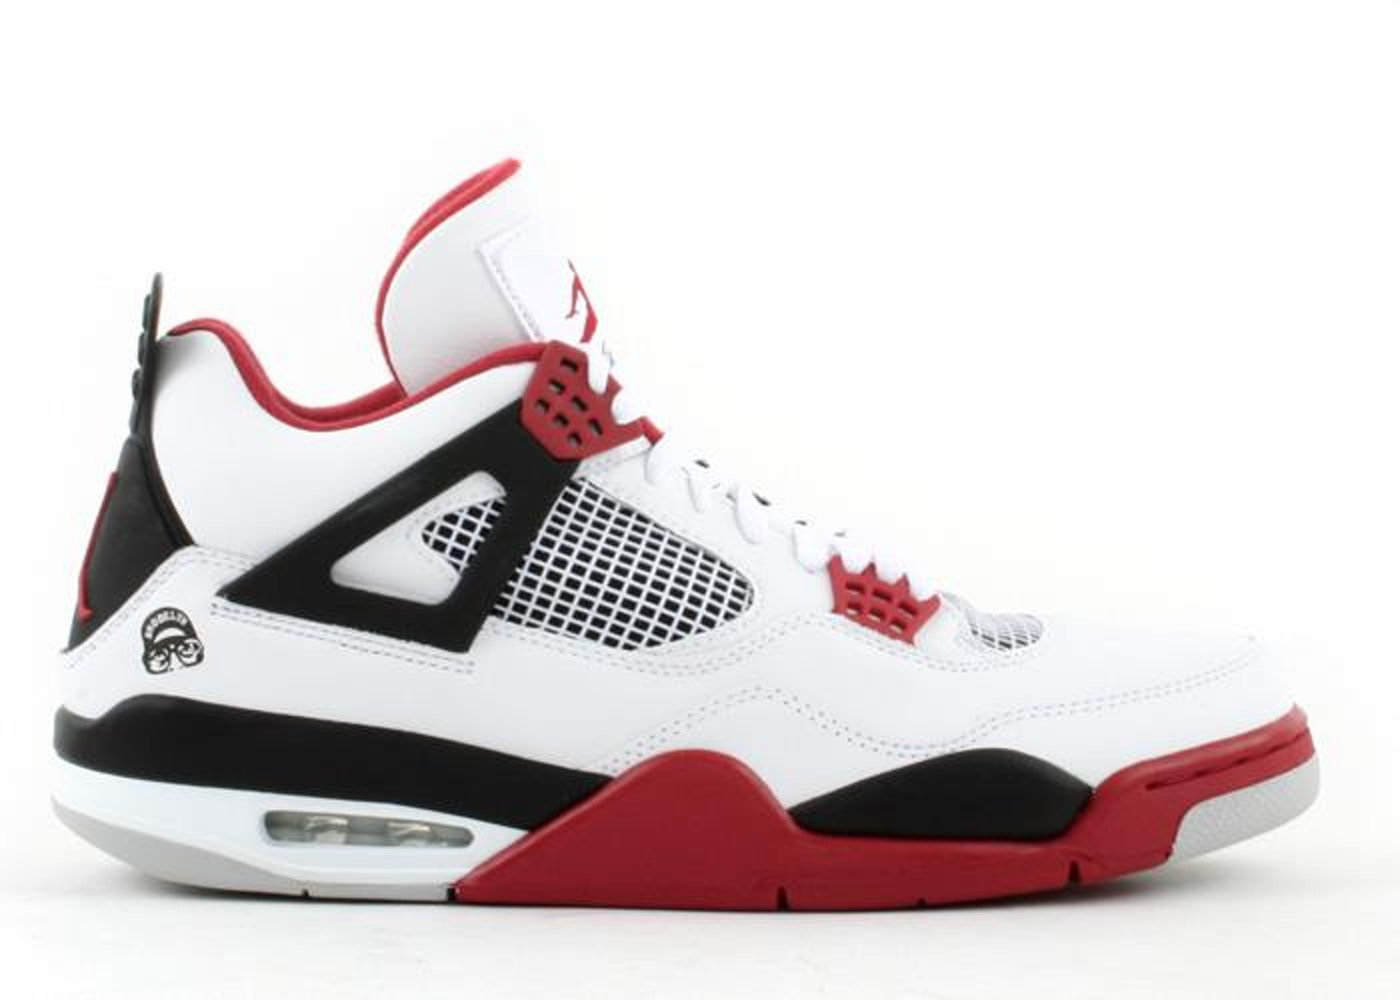 883a7d81e9b1ec Sell. or Ask. Size 9. View All Bids. Jordan 4 Retro Fire Red Mars Blackmon